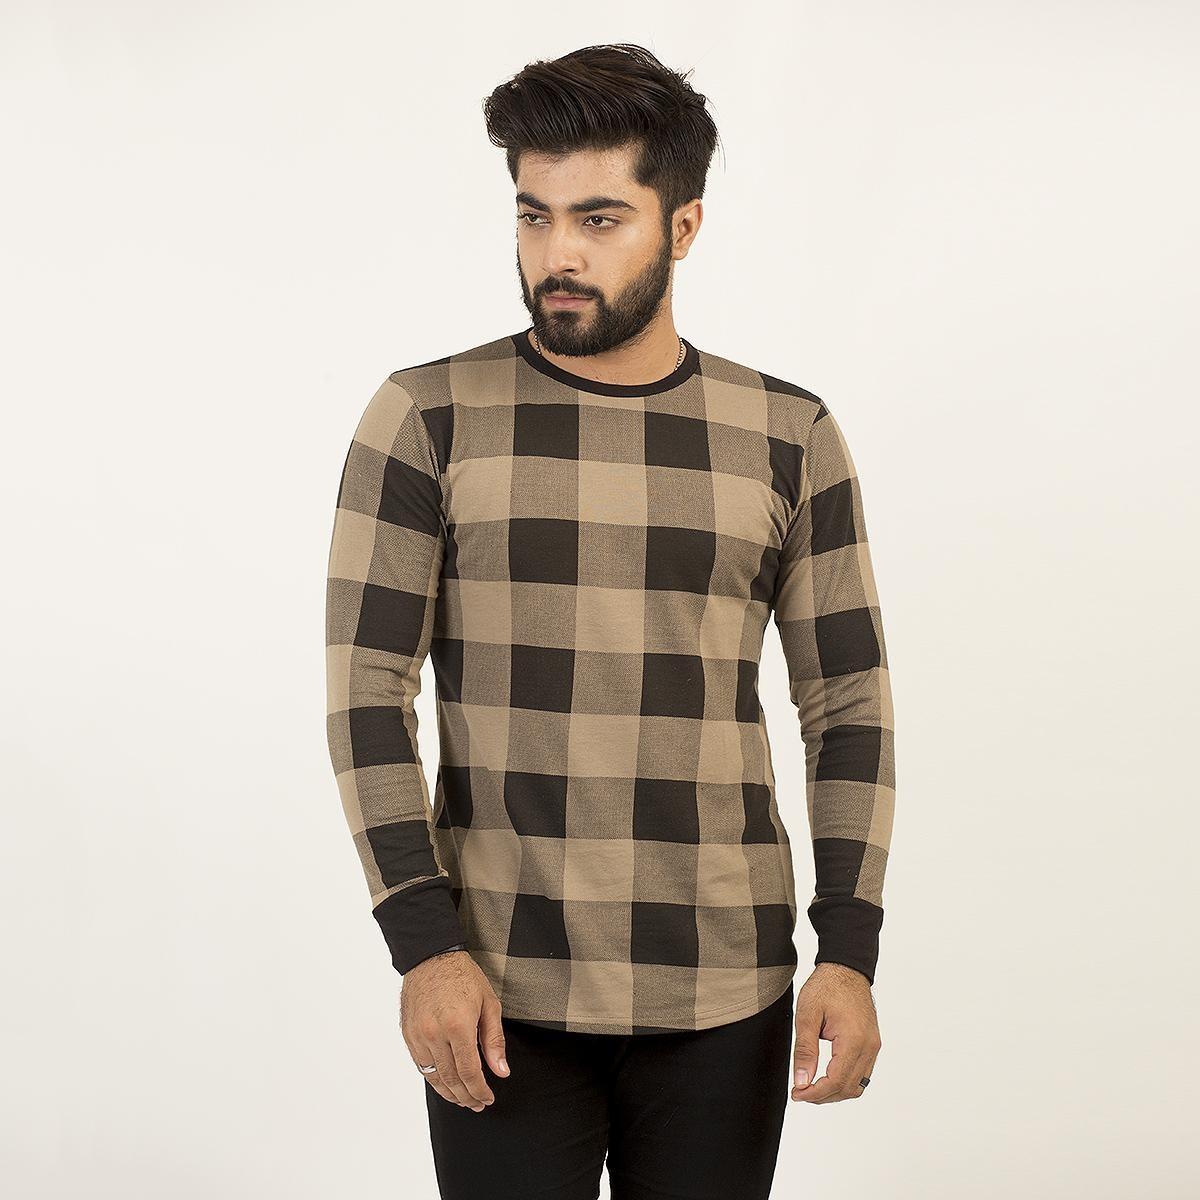 Paradise Zone Full Sleeves Ligth Brown Tshirt For Men